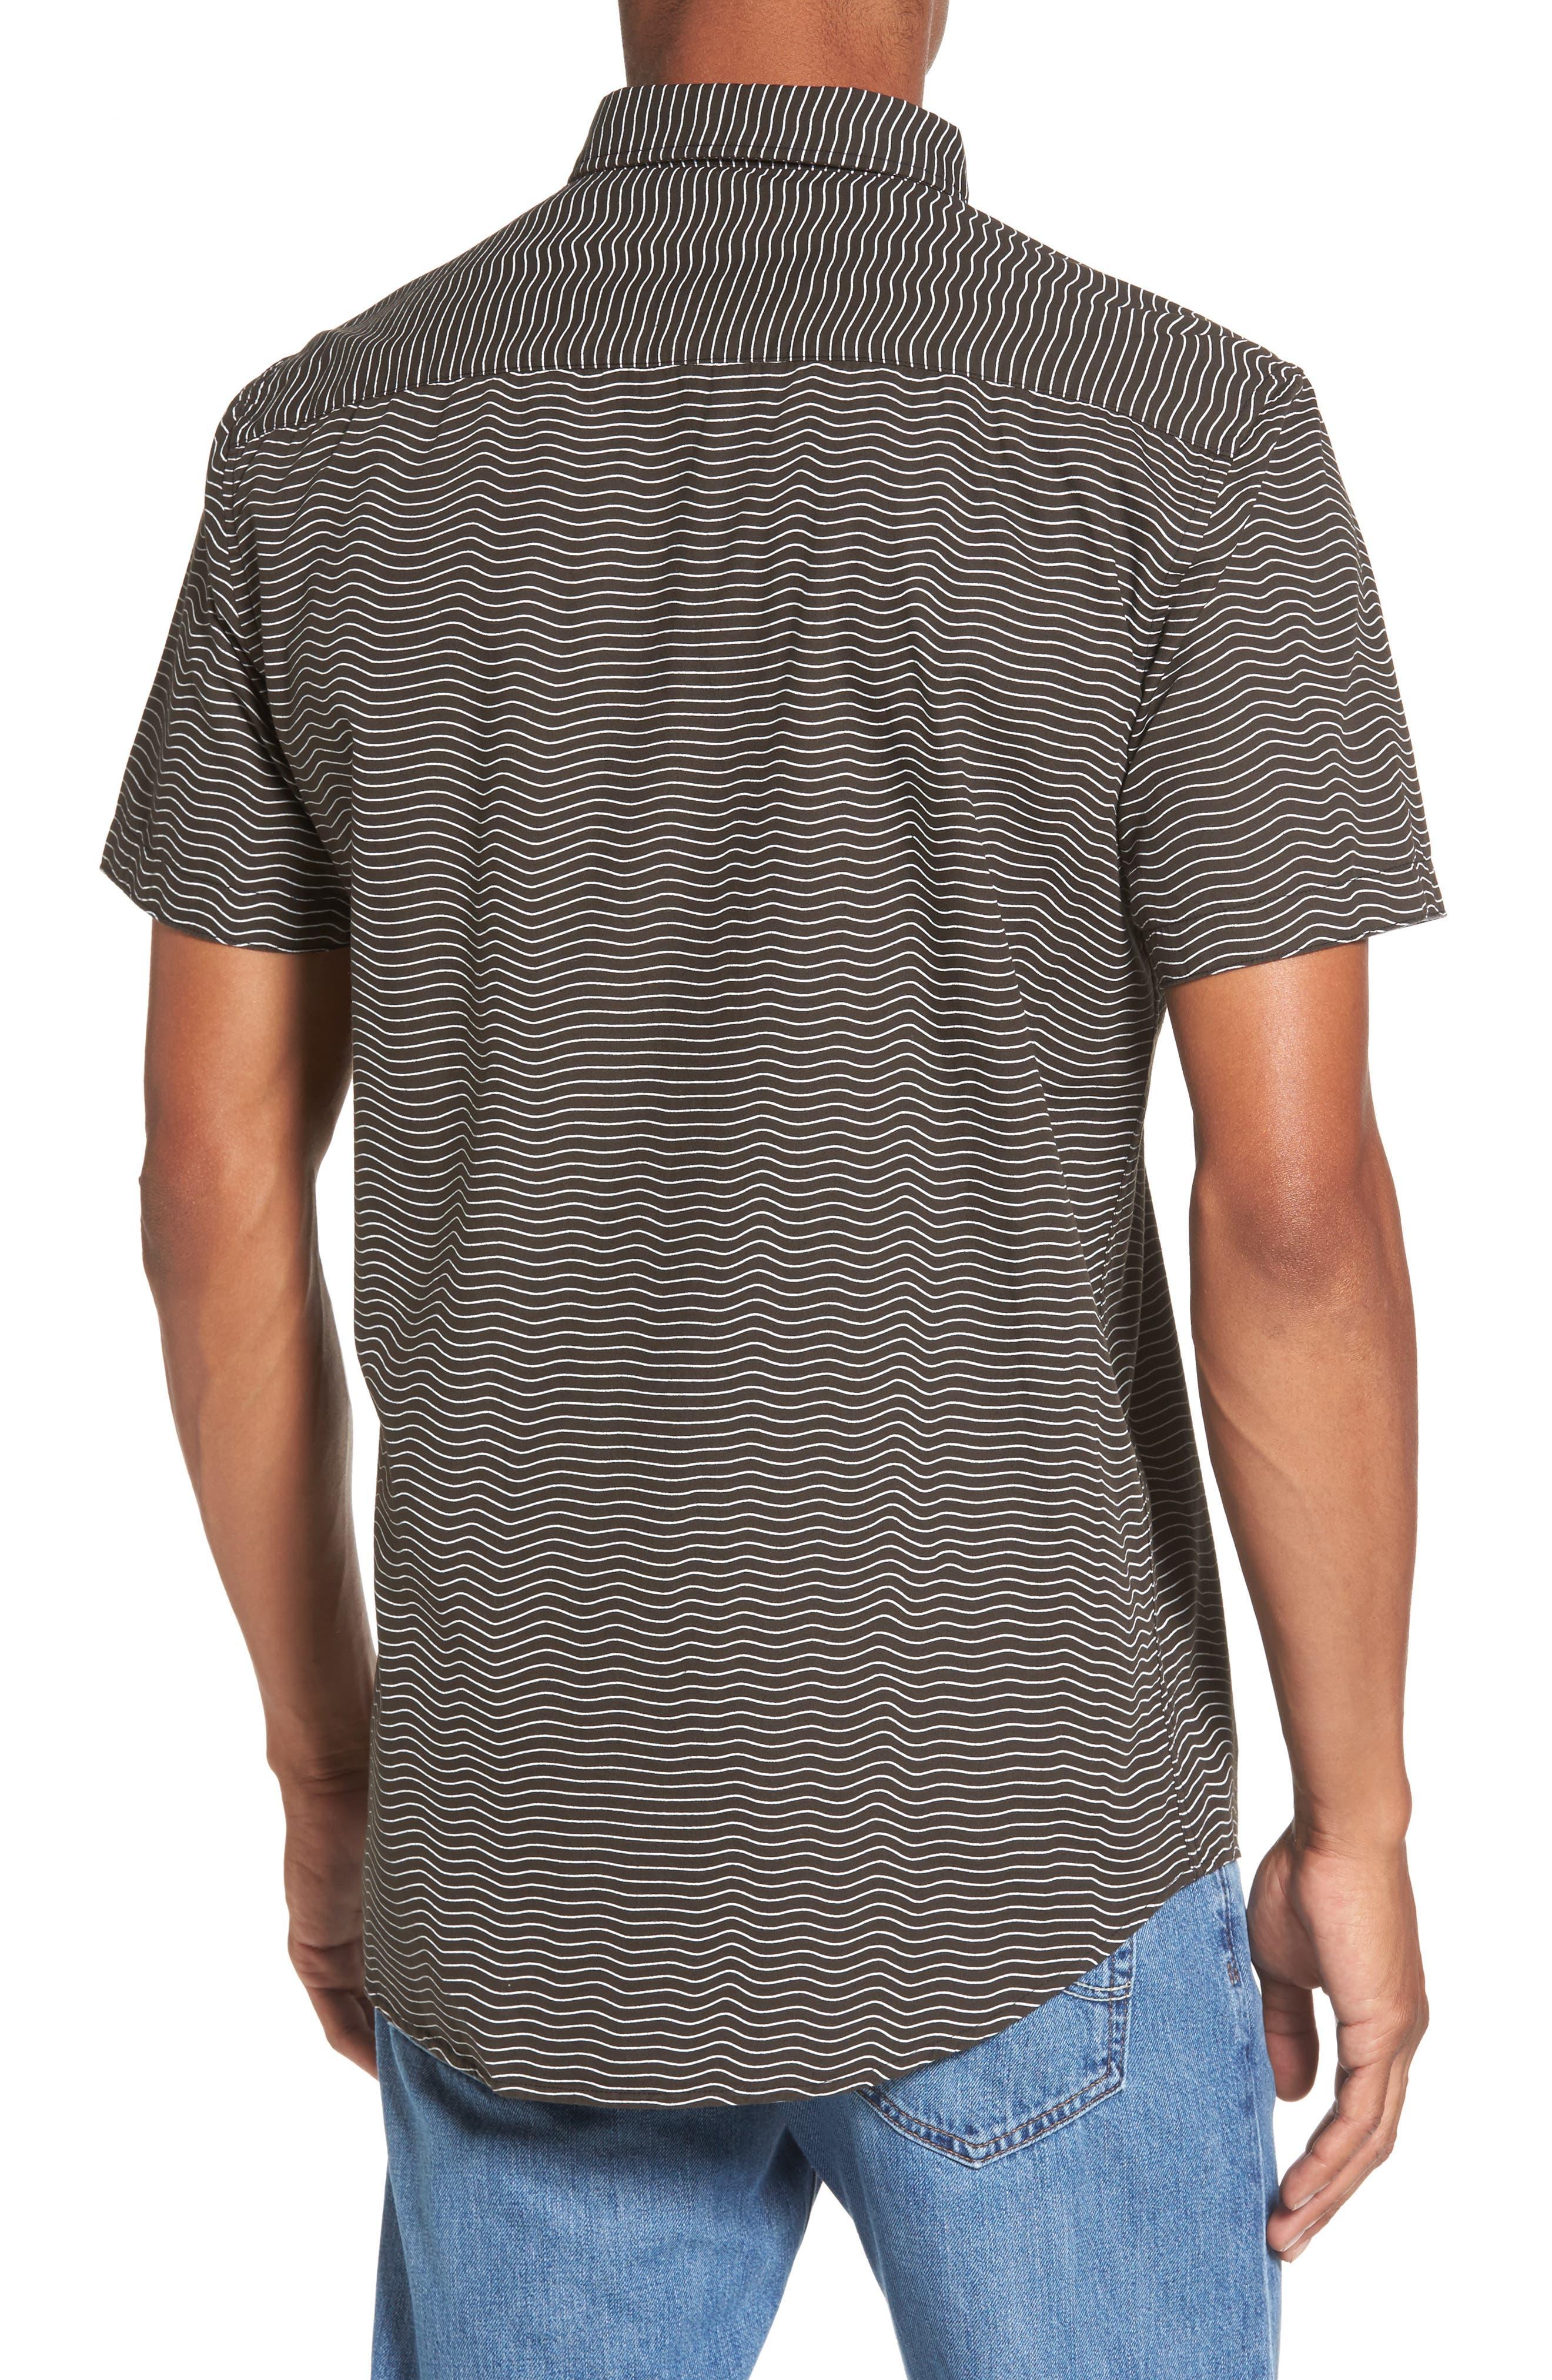 Heat Wave Stripe Shirt,                             Alternate thumbnail 2, color,                             002